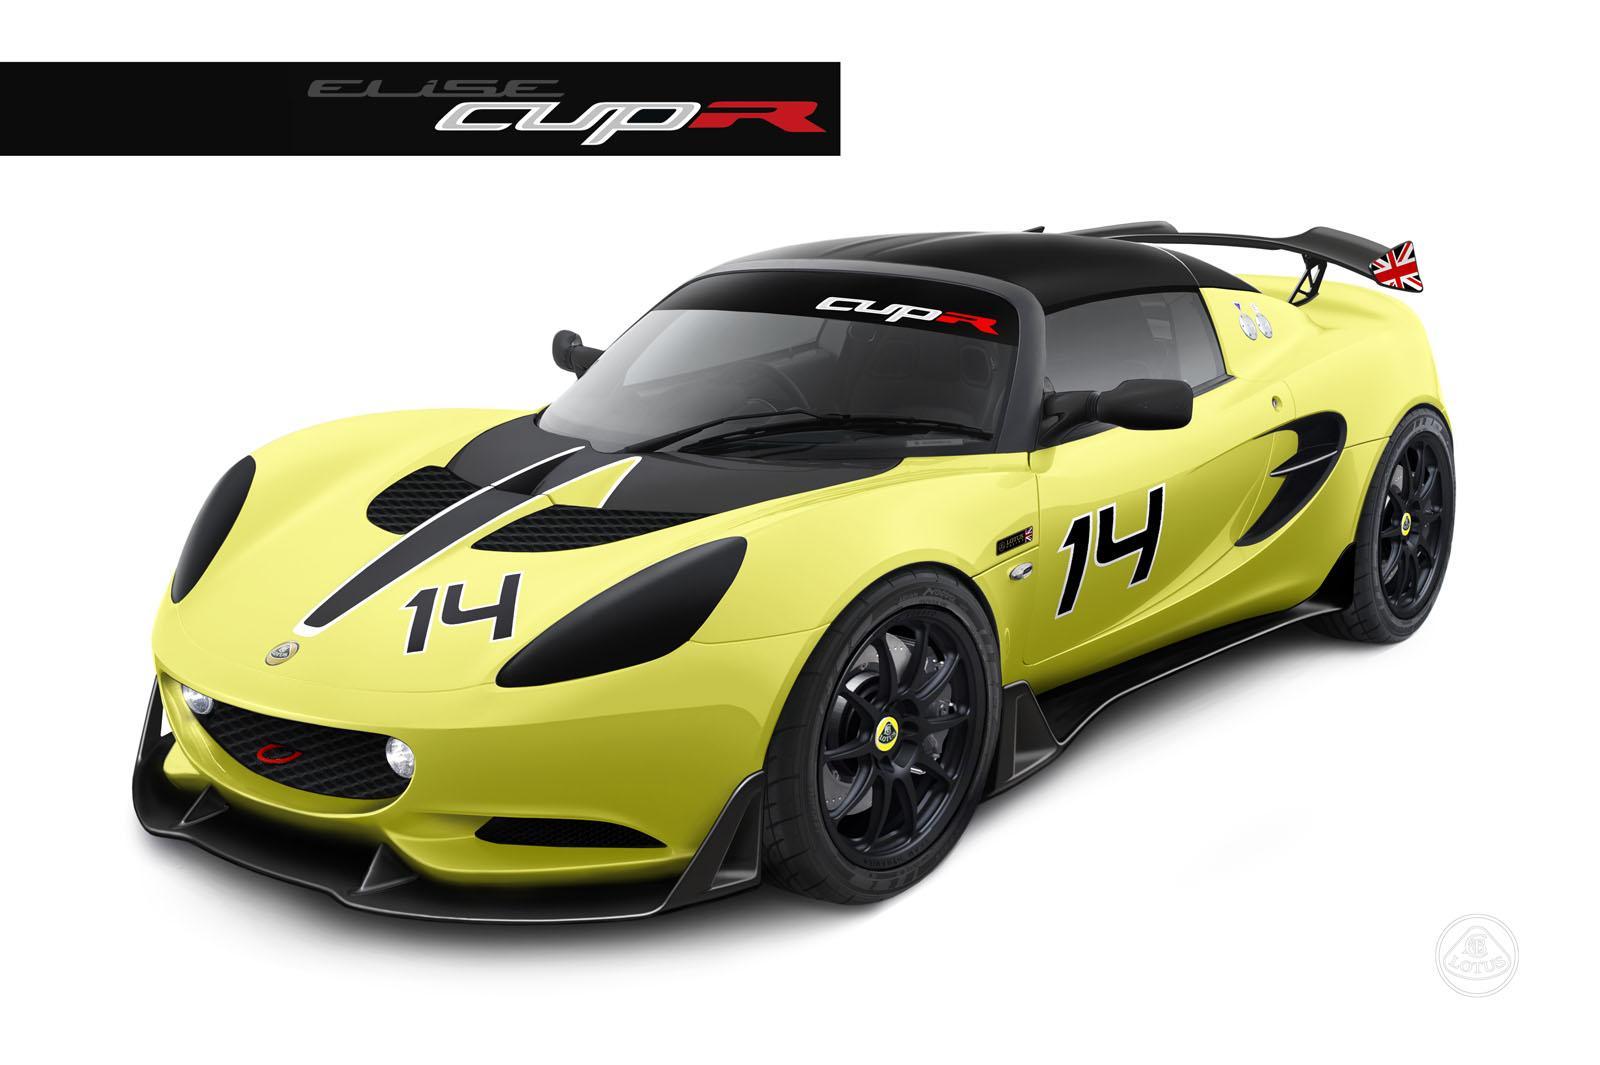 lotus cars news track only 2014 elise s cup r. Black Bedroom Furniture Sets. Home Design Ideas